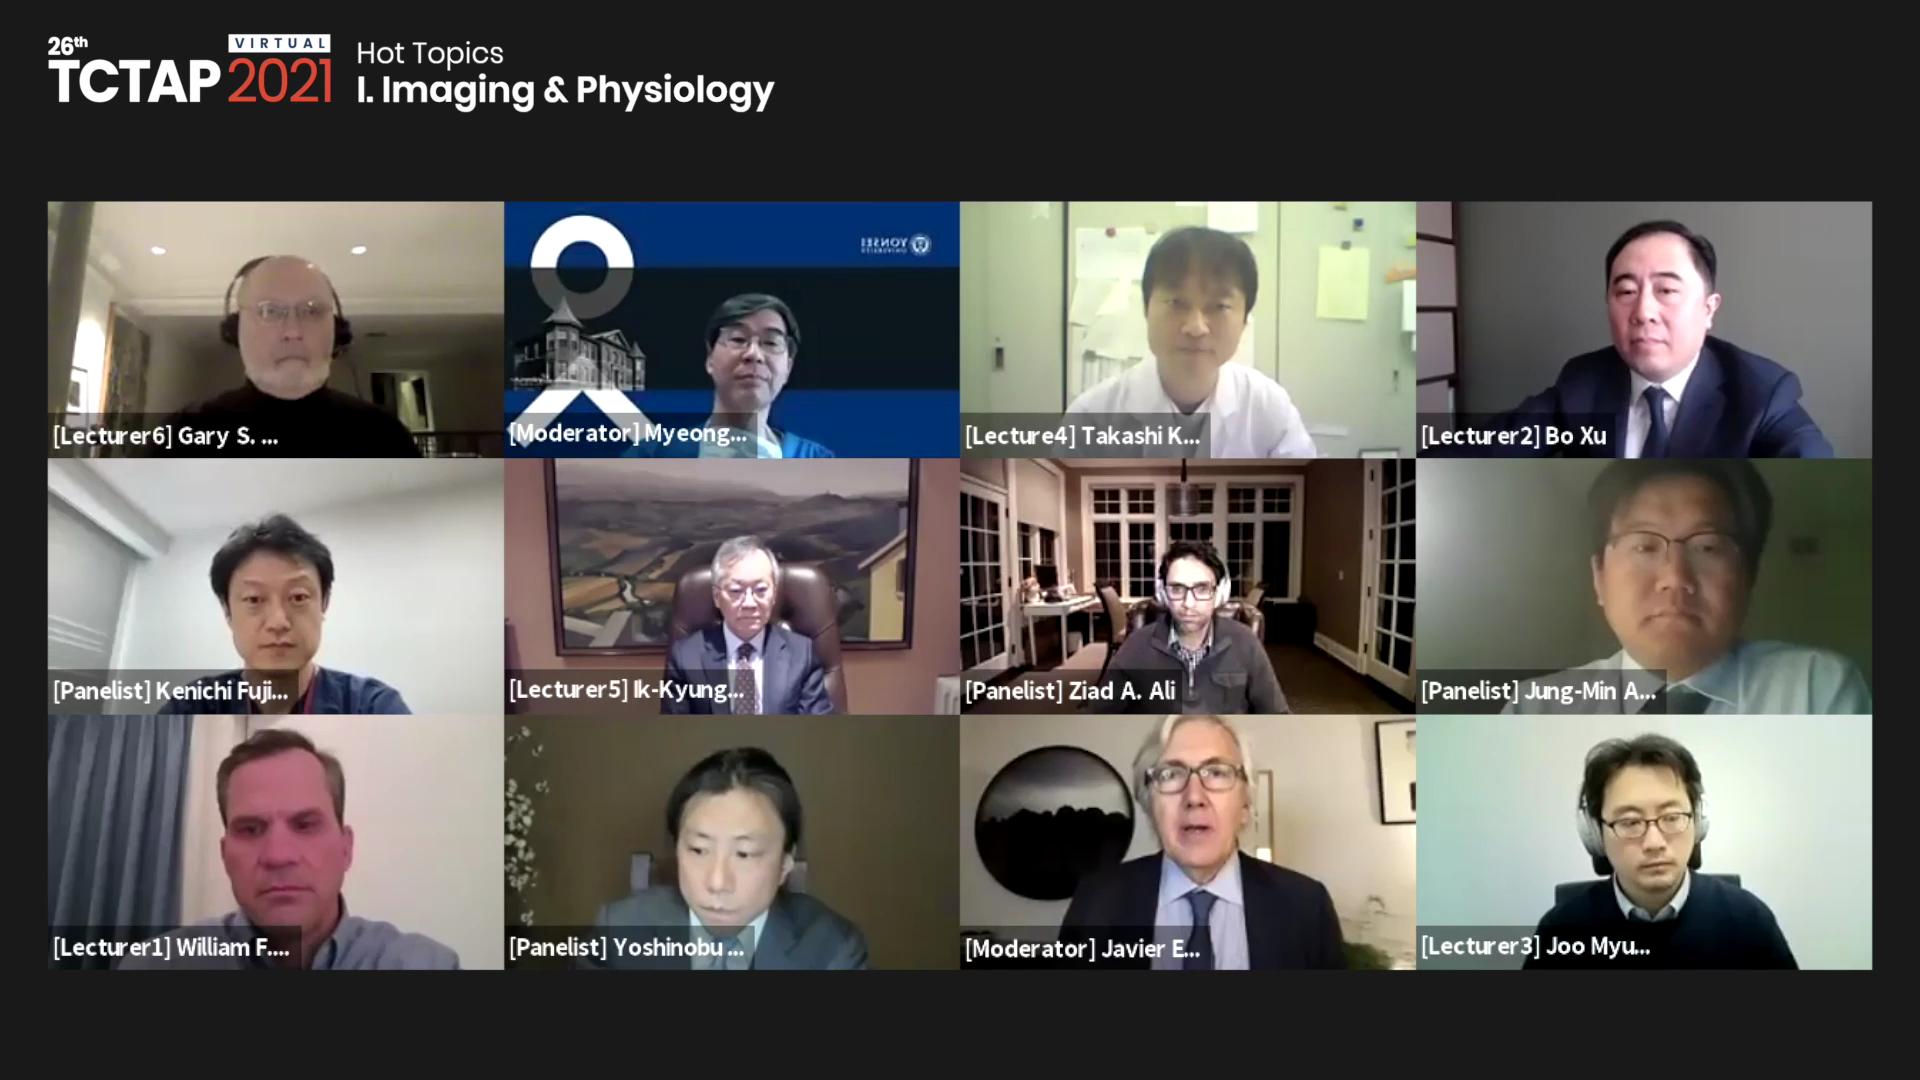 [TCTAP 2021 Virtual] Hot Topics - I. Imaging & Physiology